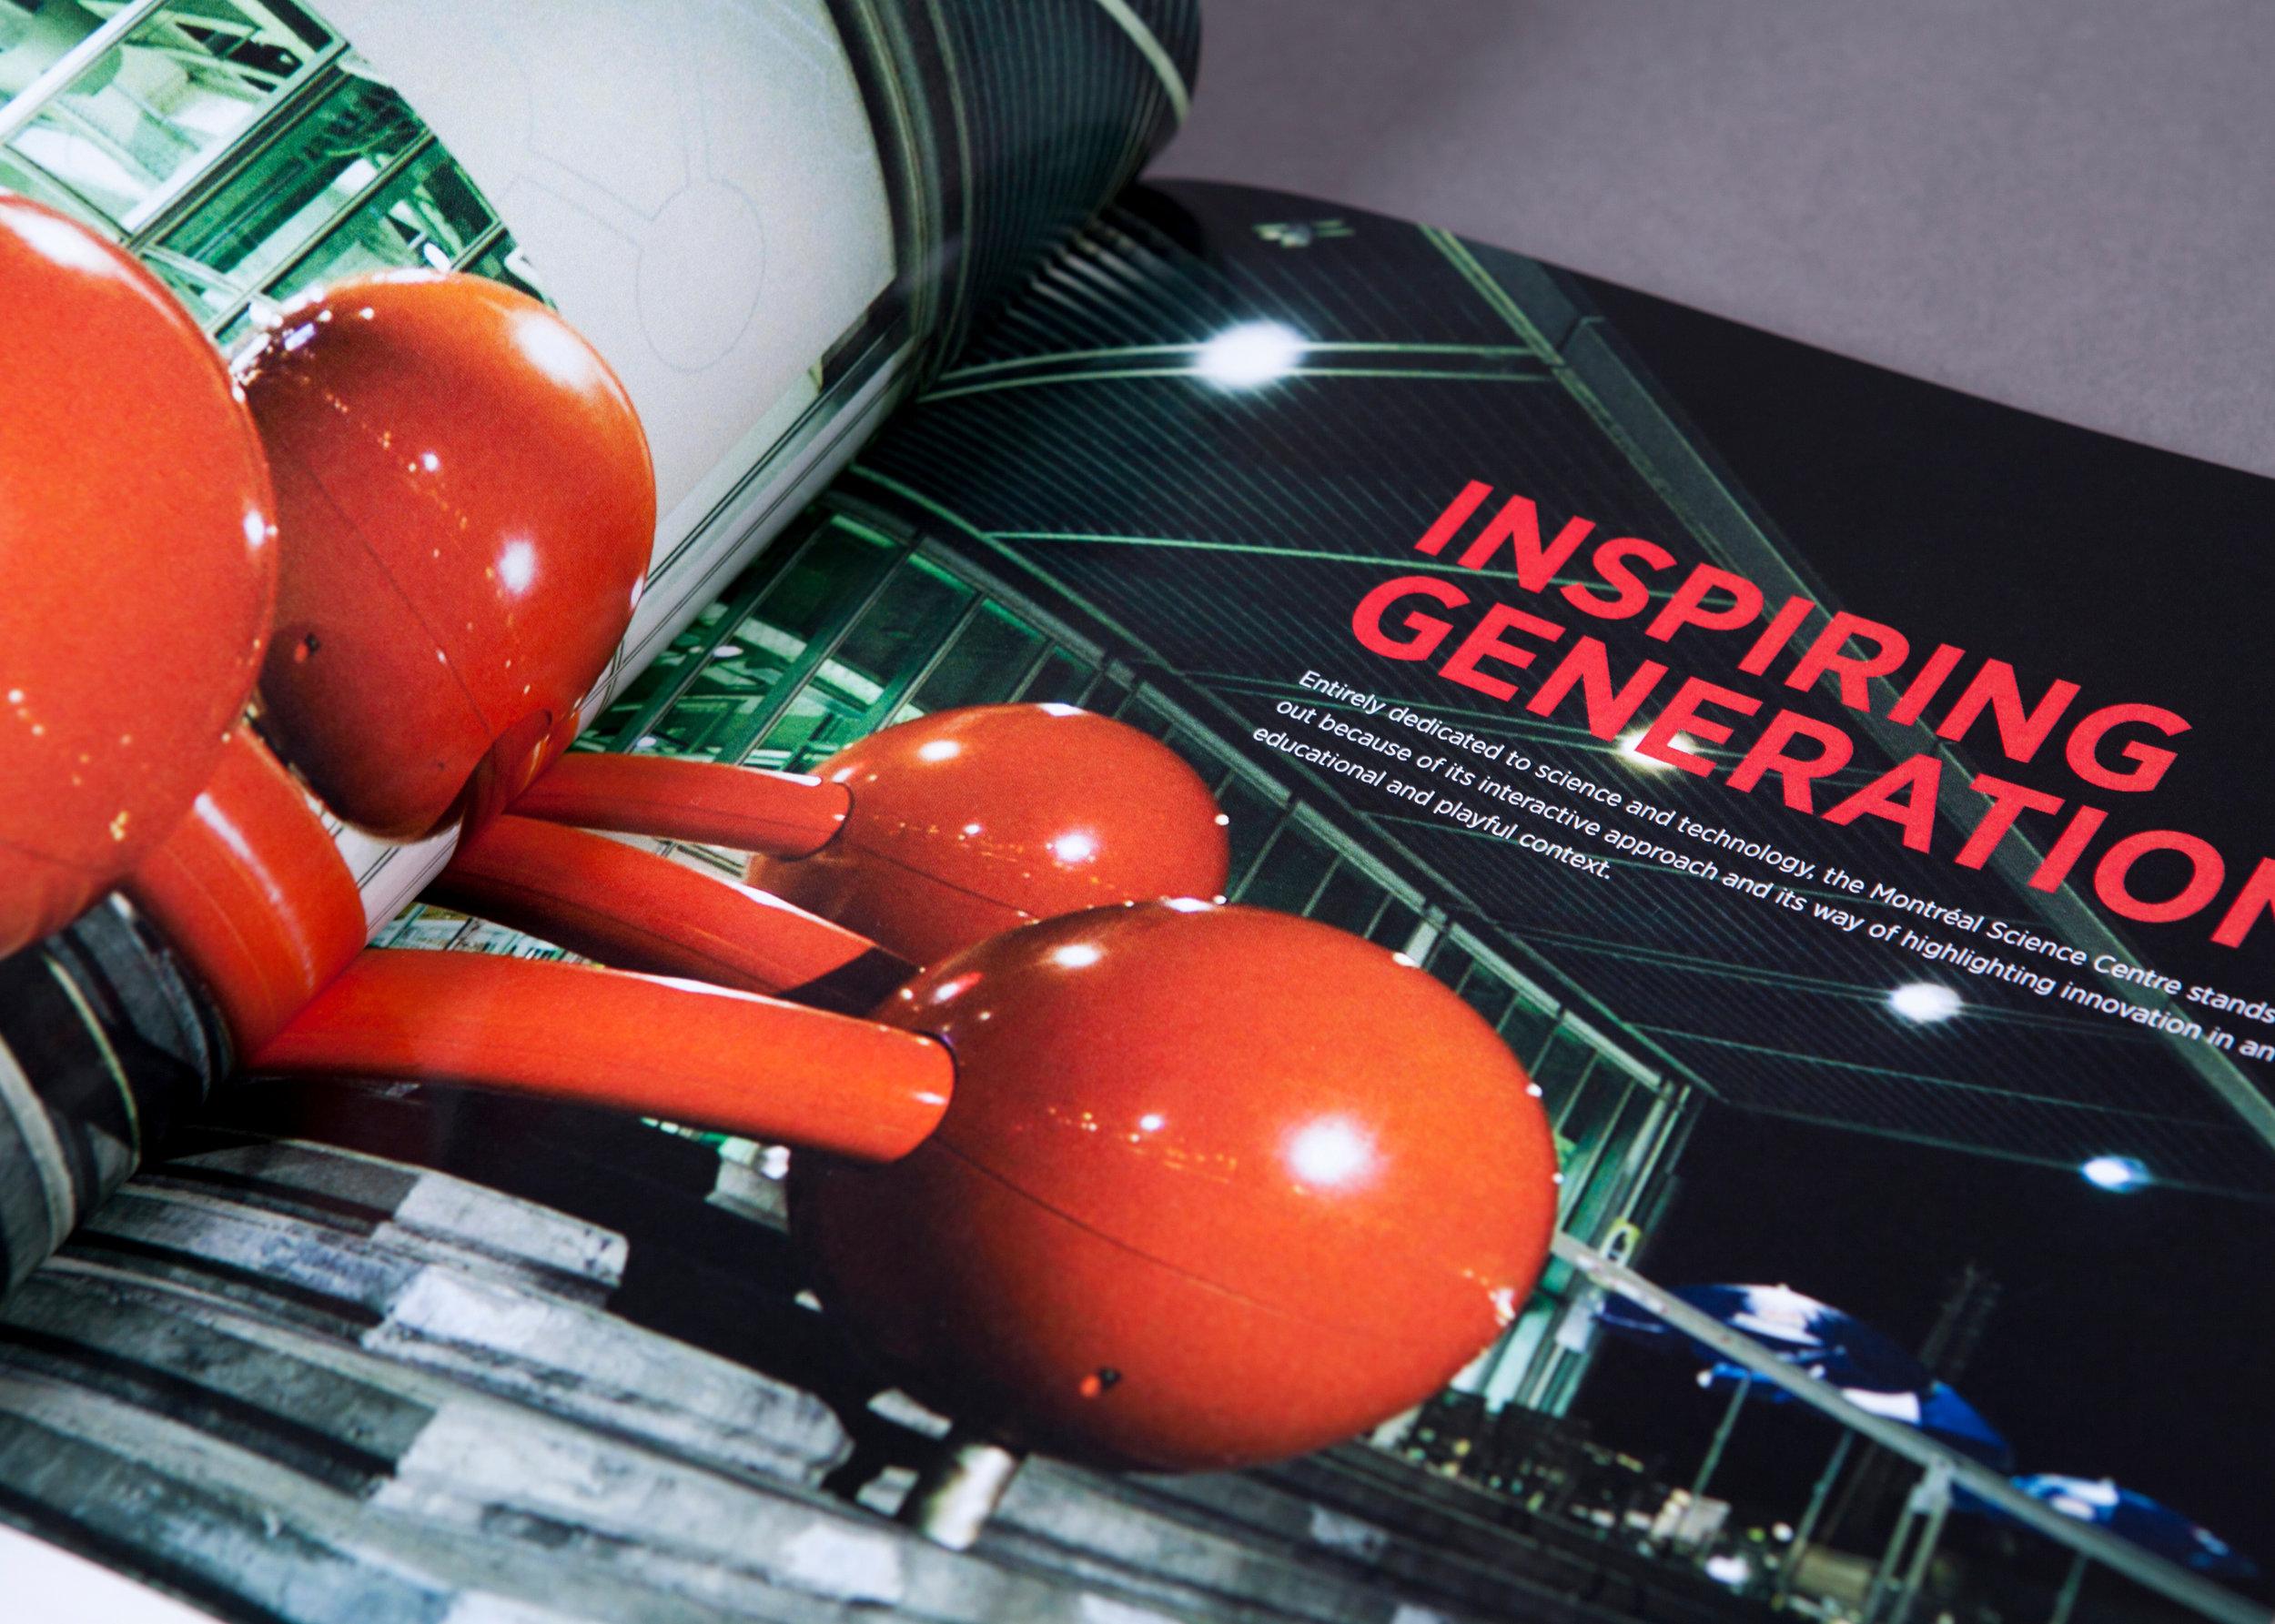 canada-lands-corporation-annual-report-4-sputnik-design-partners-toronto.jpg